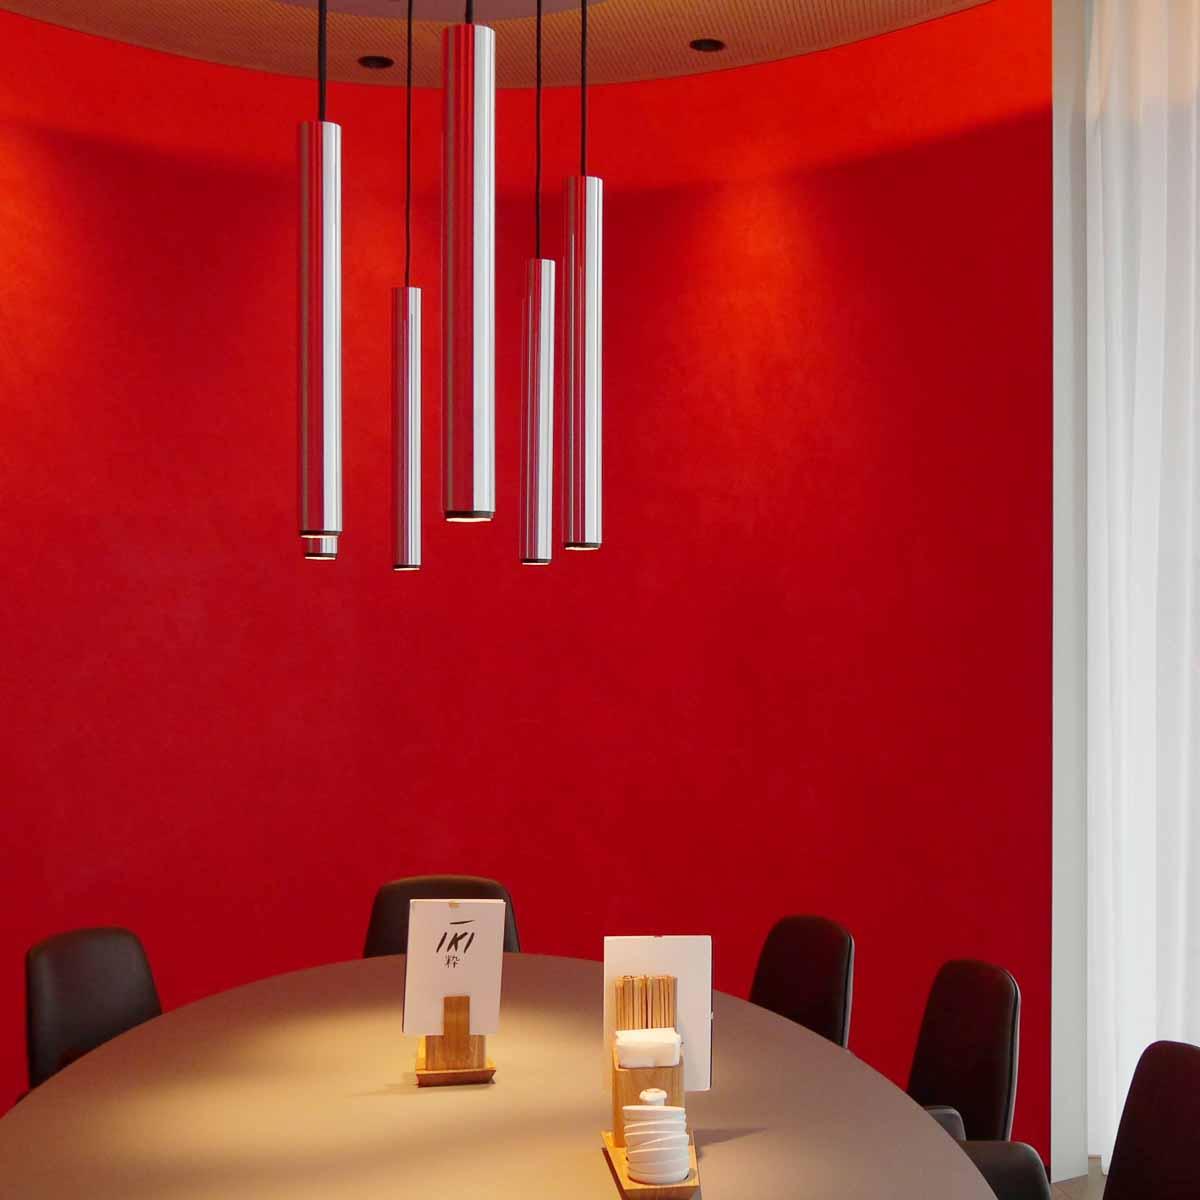 IKI Restaurant in Wien